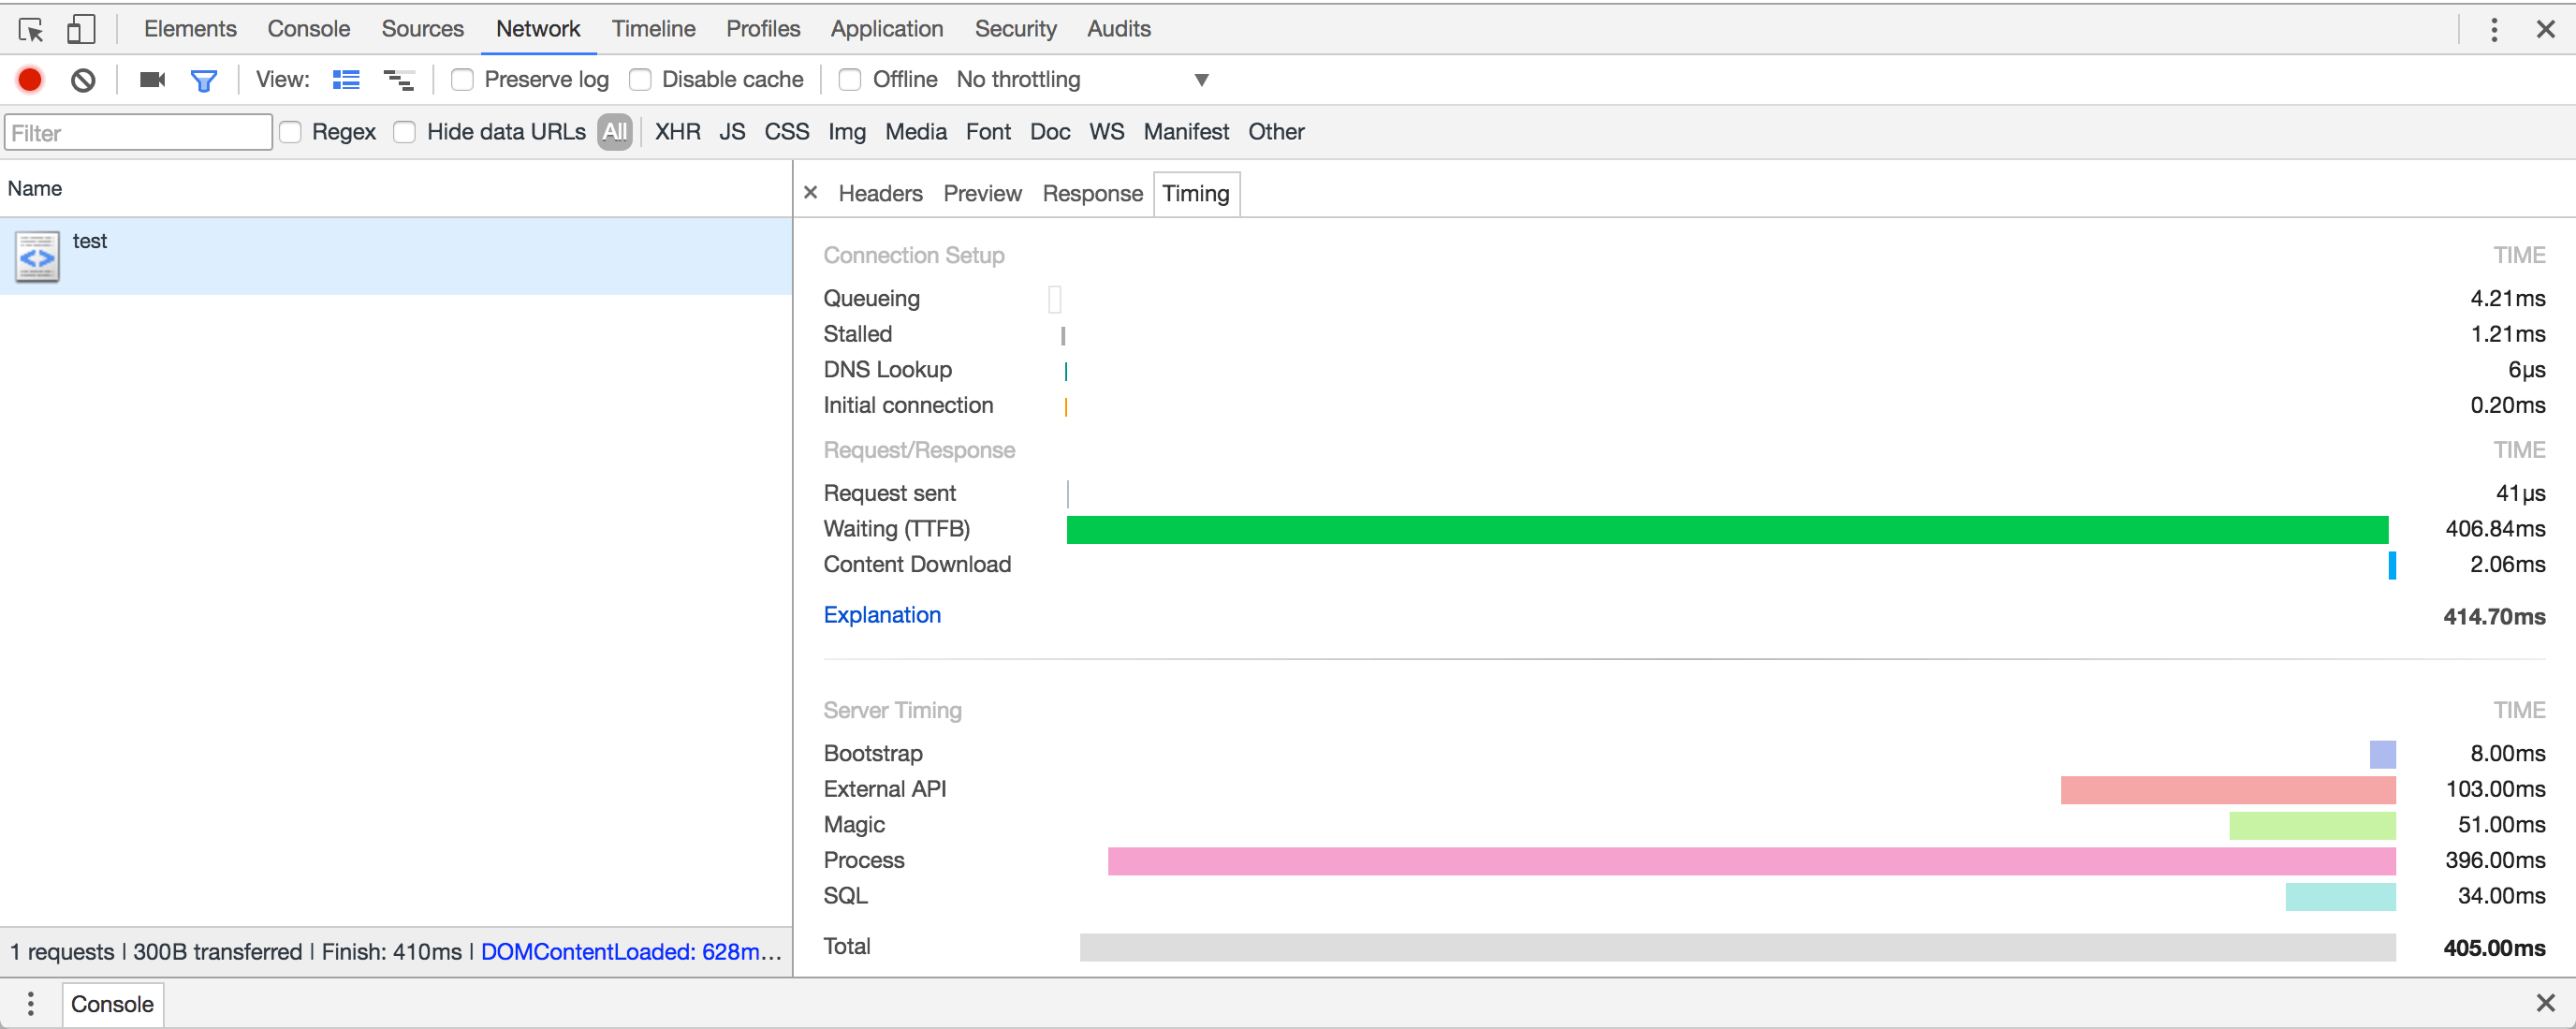 Server Timing